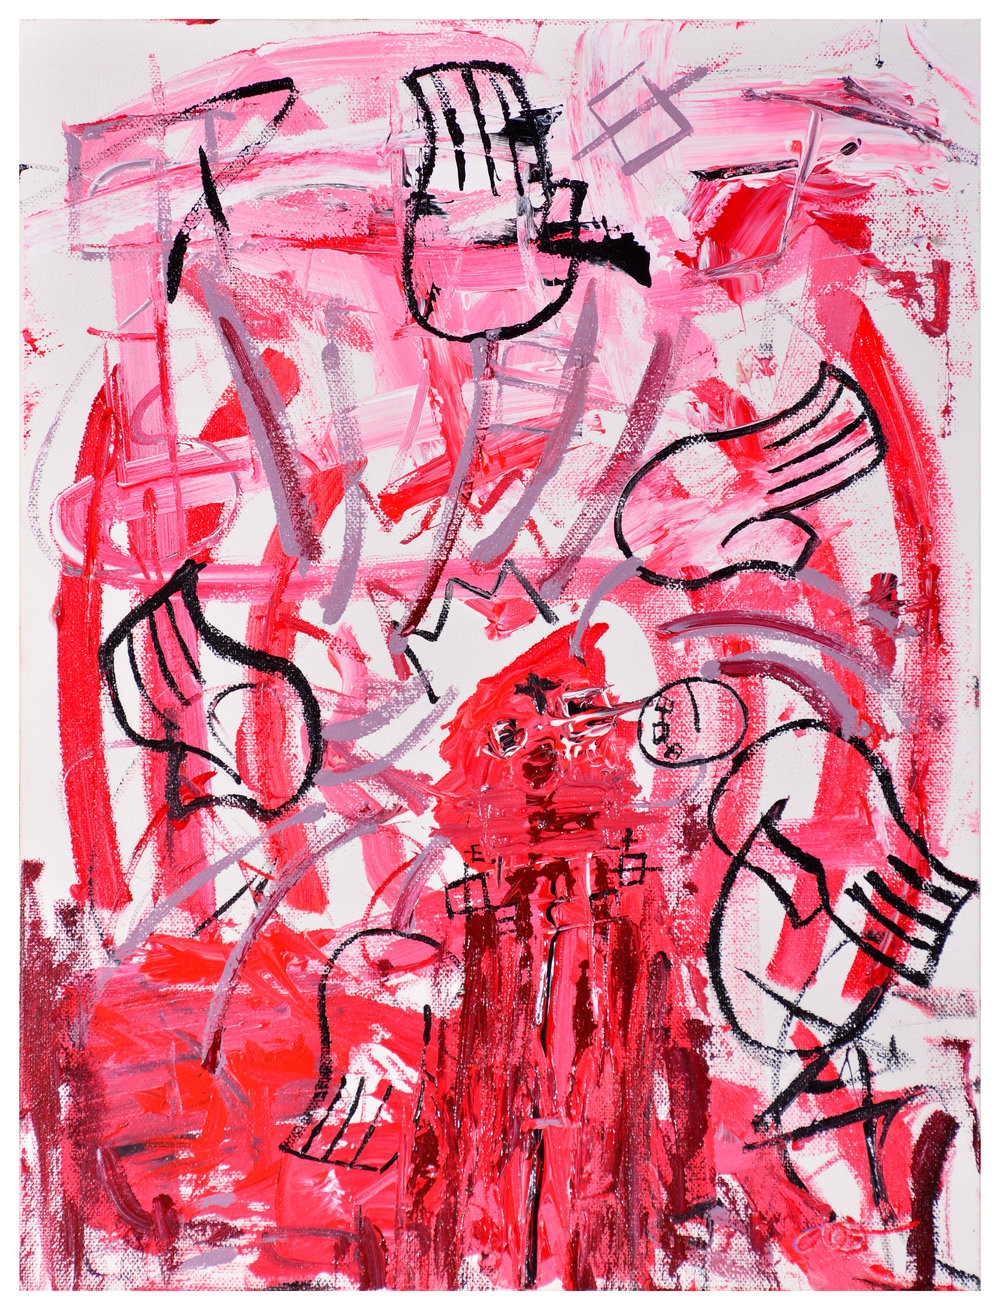 Bleeding Heart IV - Red Hands